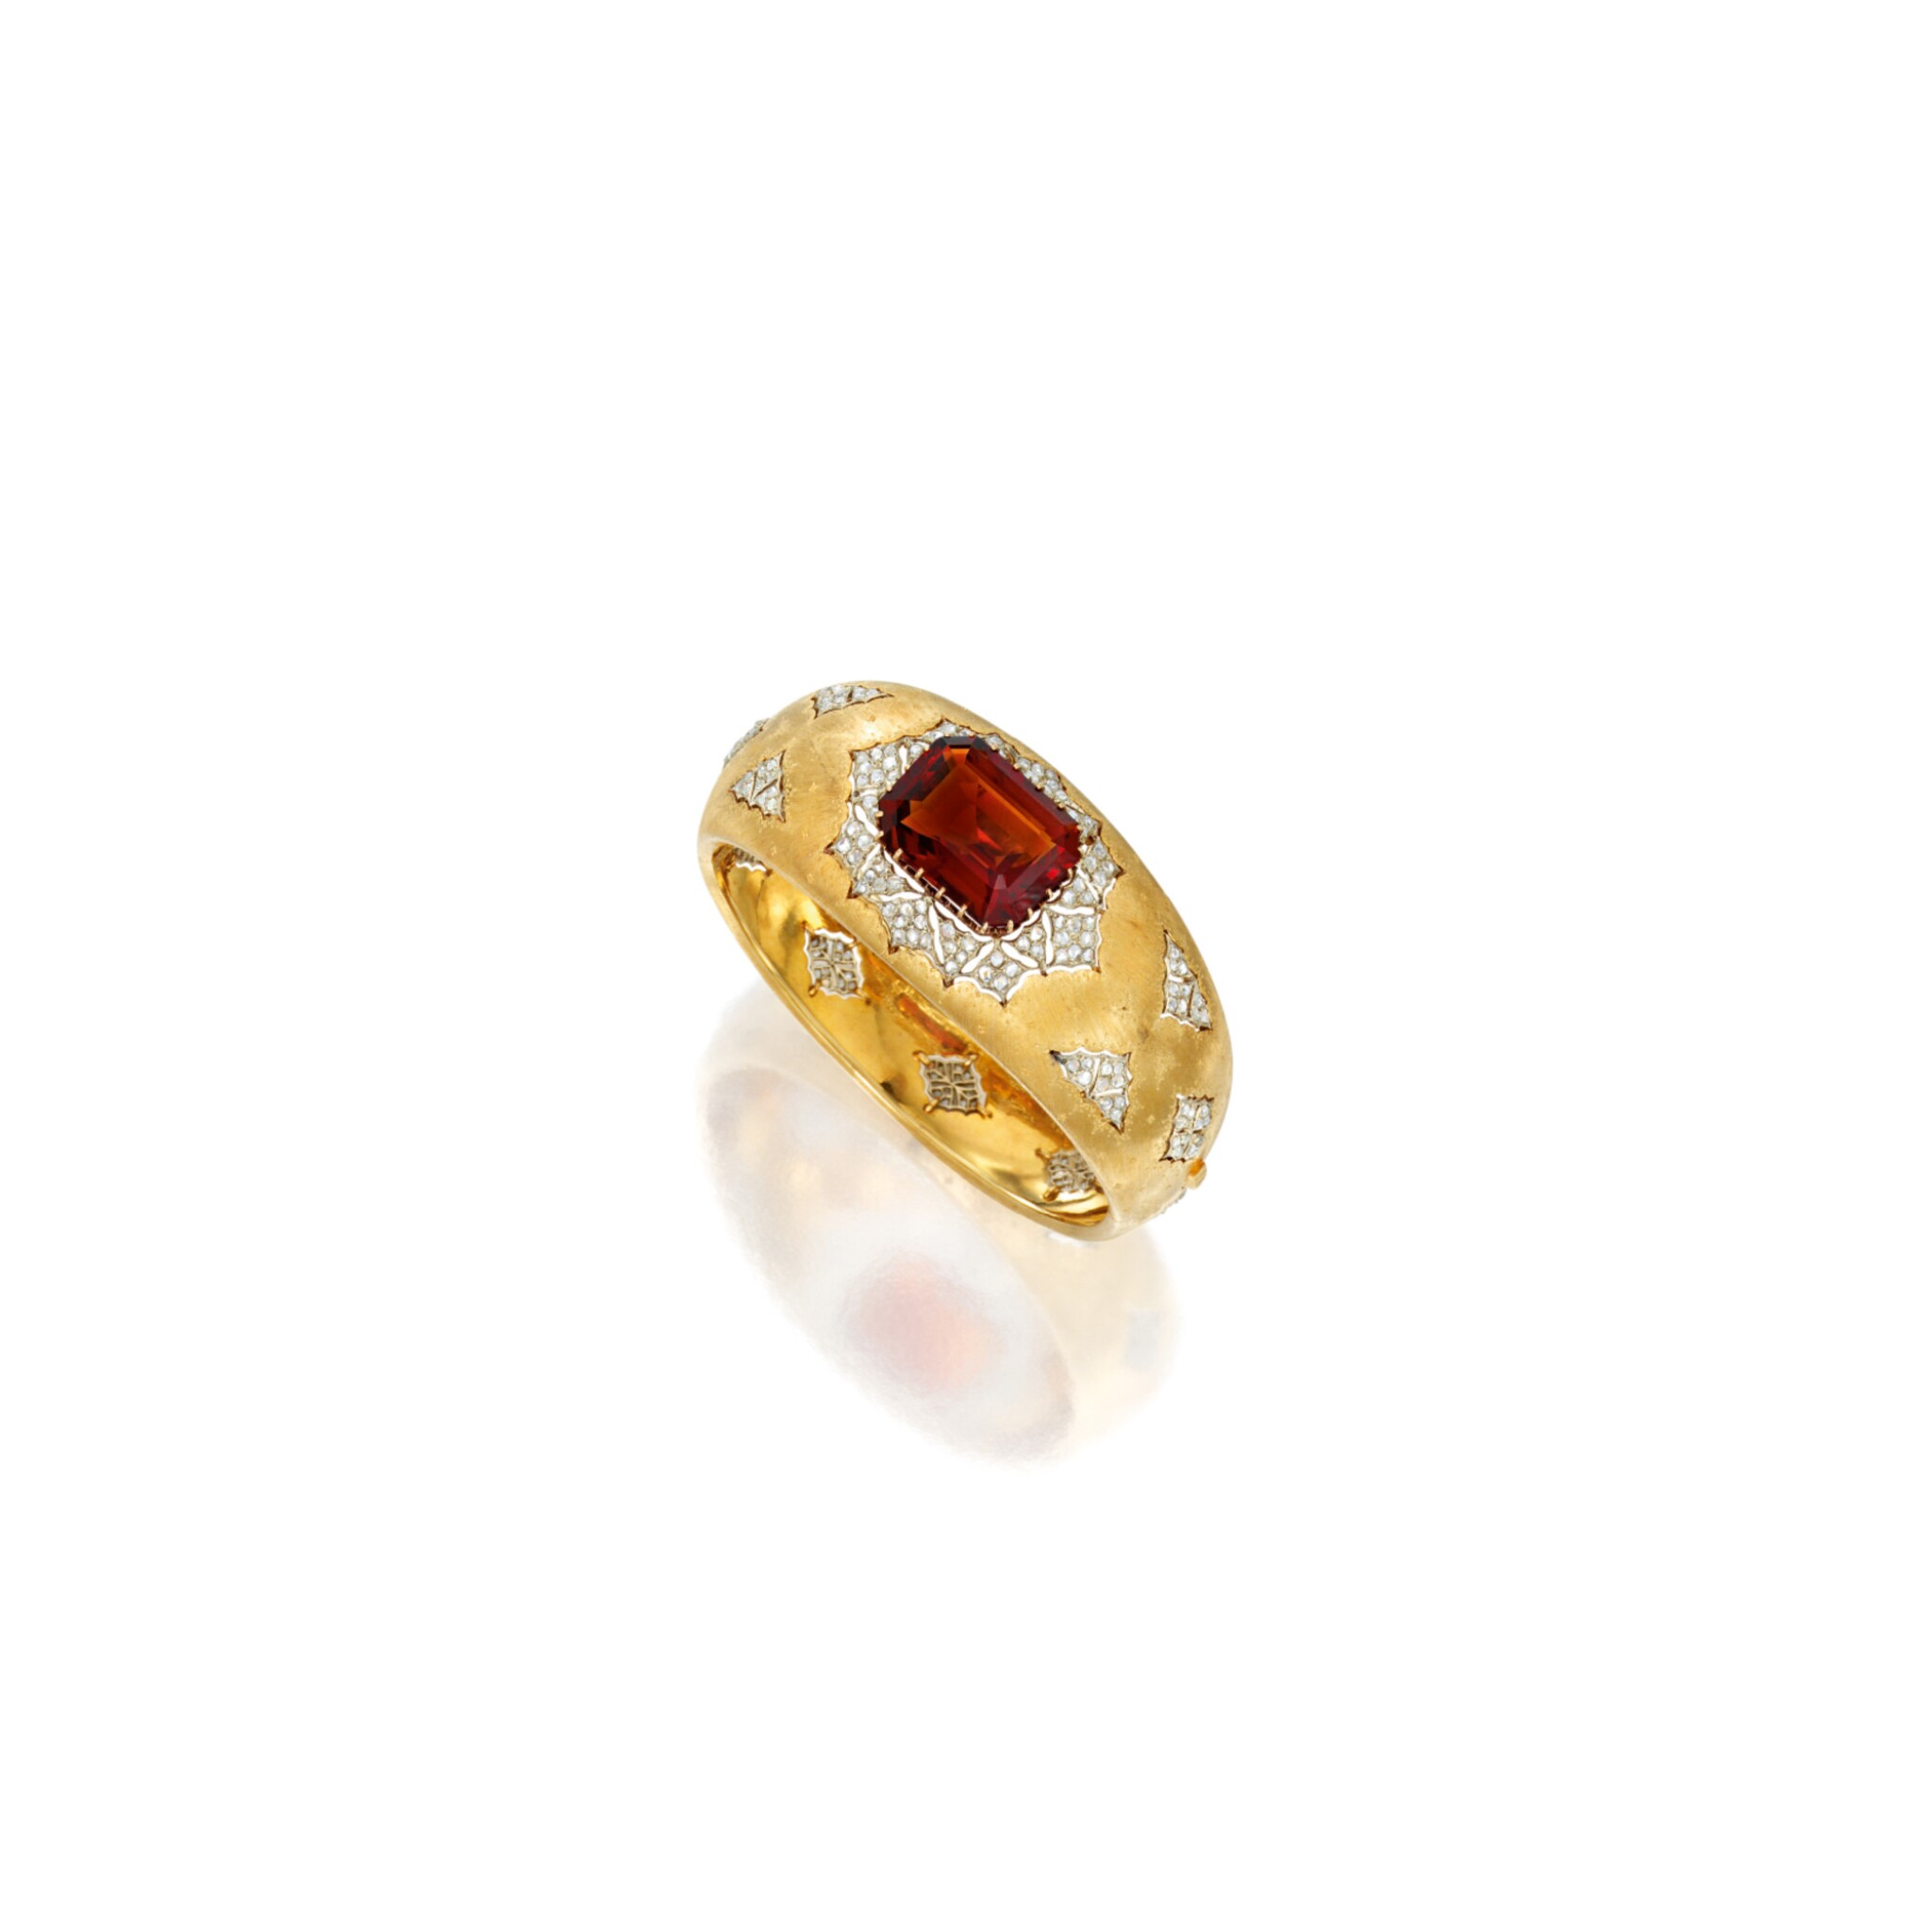 TWO-COLOR GOLD, CITRINE AND DIAMOND BRACELET, BUCCELLATI | 雙色黃金鑲黃水晶配鑽石手鏈,Buccellati